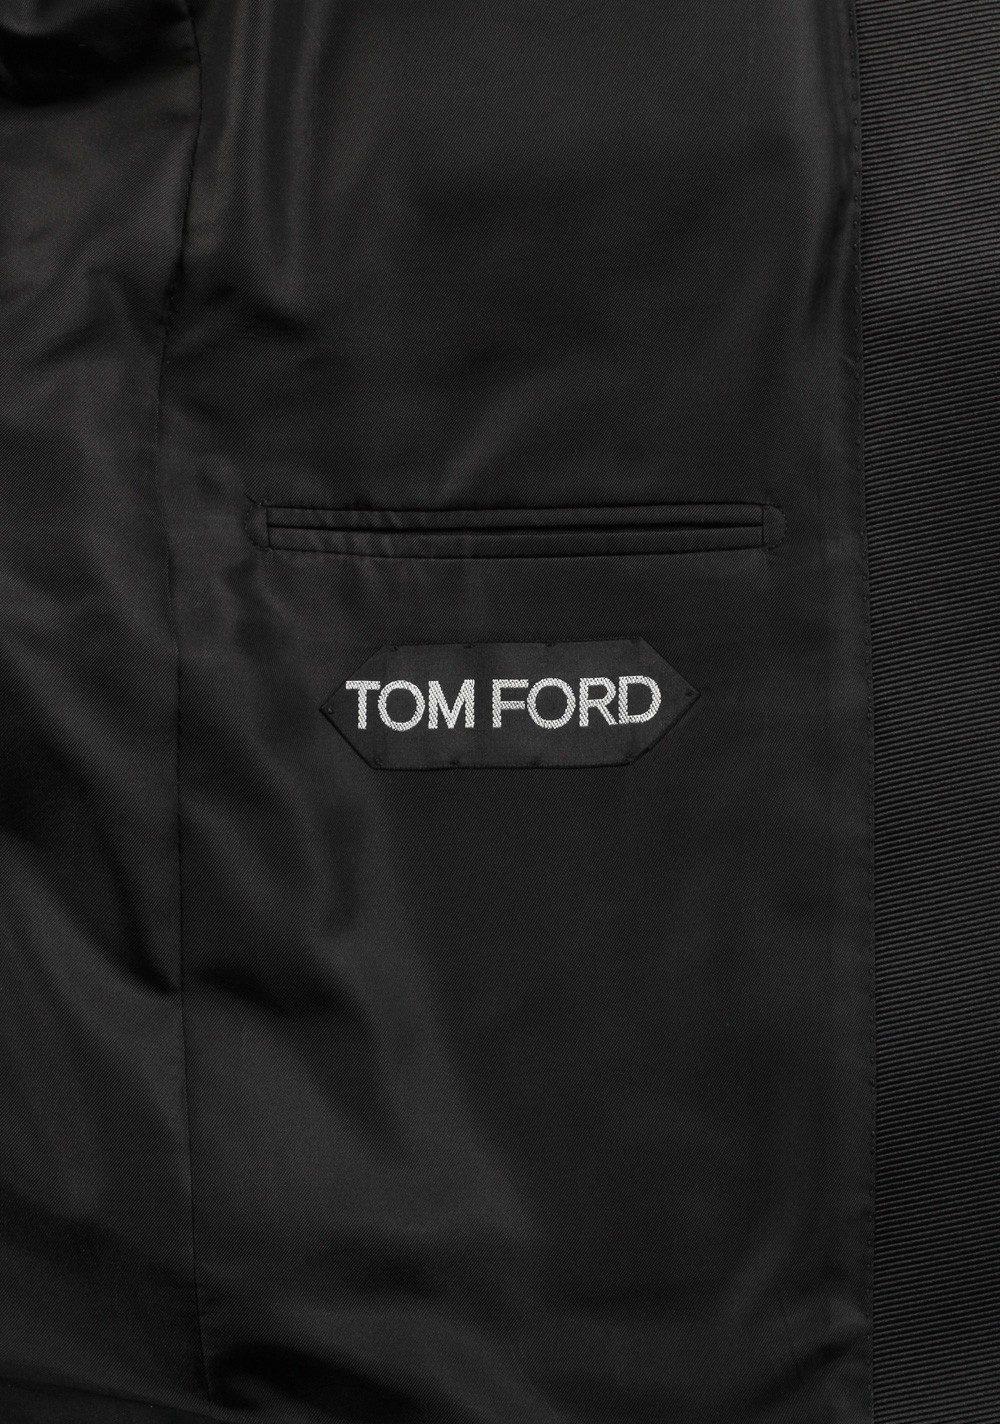 TOM FORD Windsor Black Tuxedo Suit Smoking Size 48 / 38R U.S. Fit A | Costume Limité